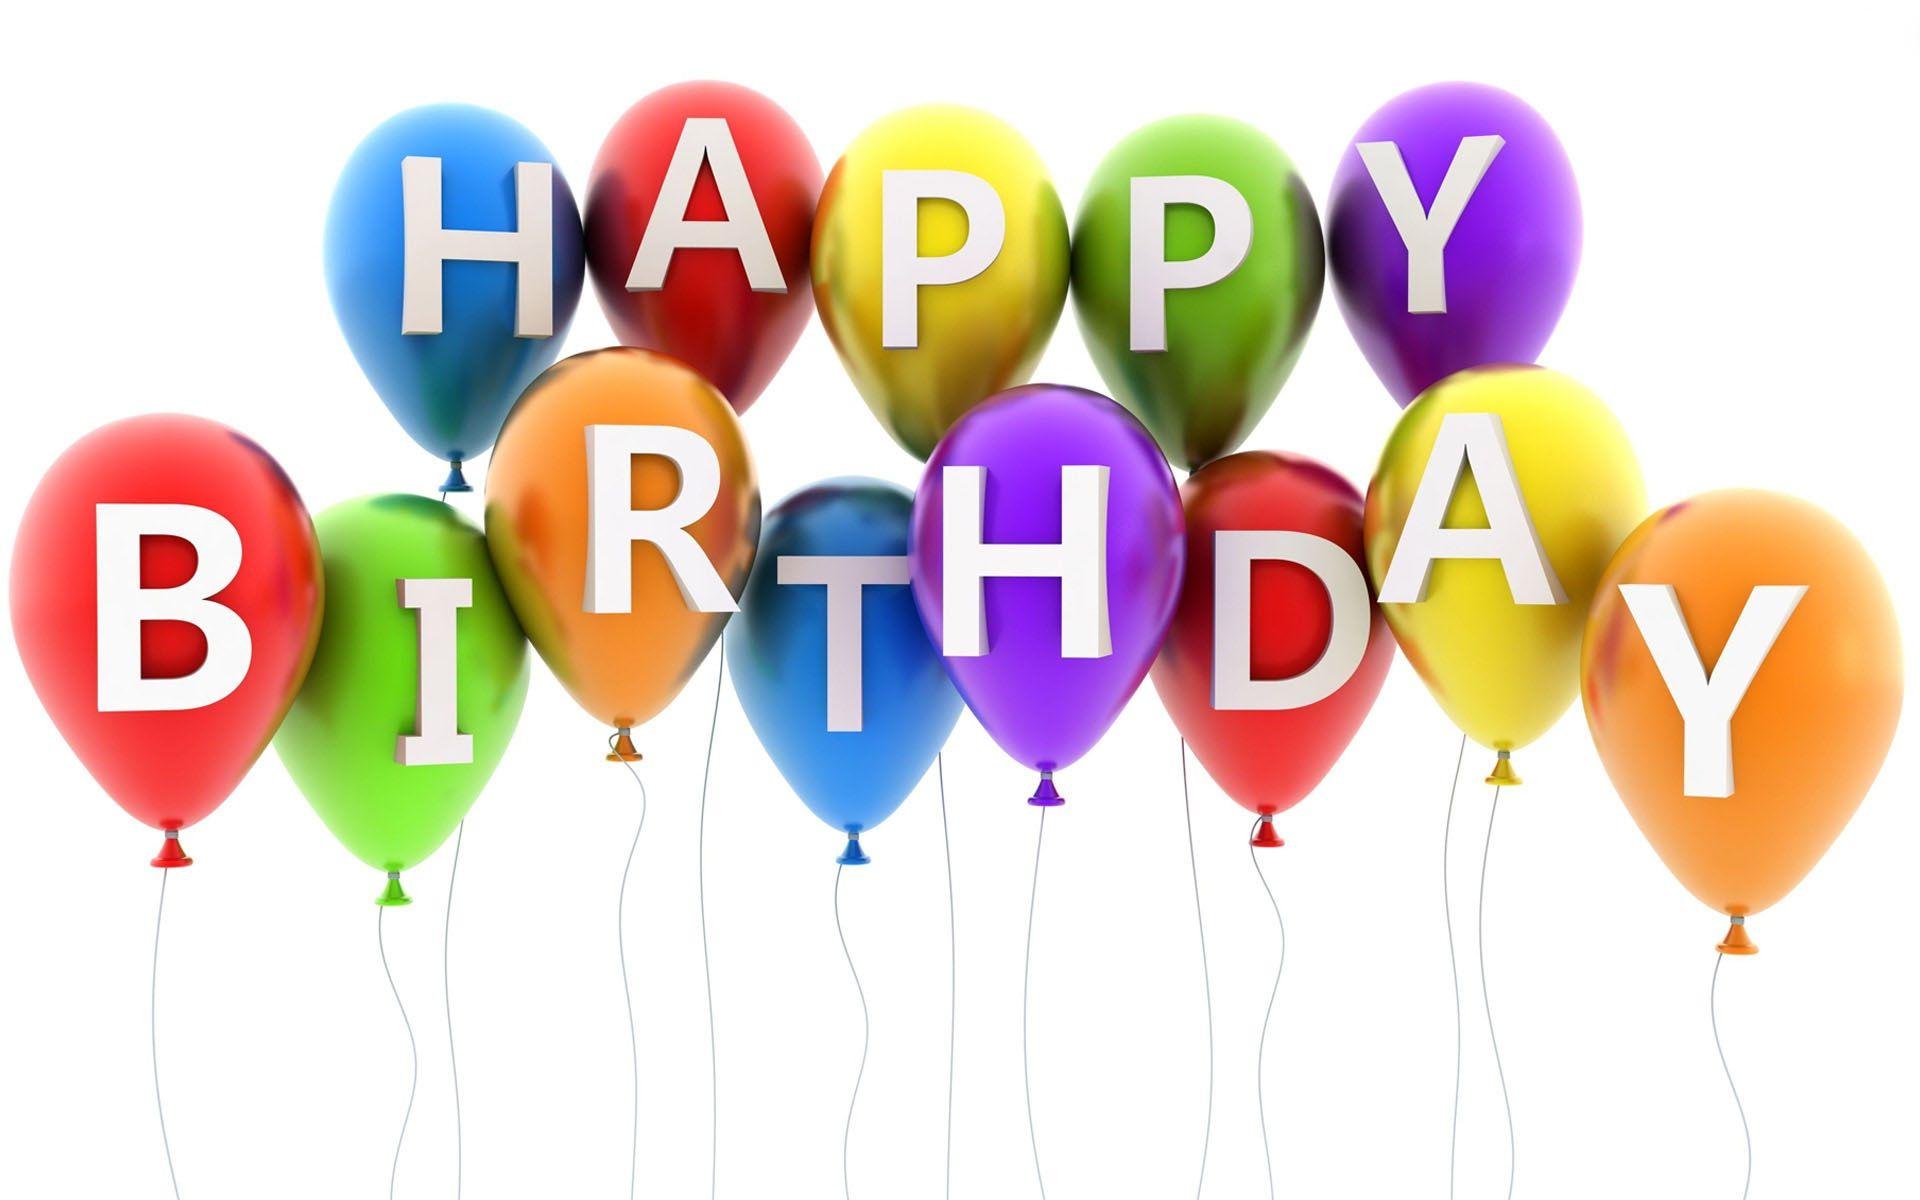 Happy Birthday Balloons   My blog